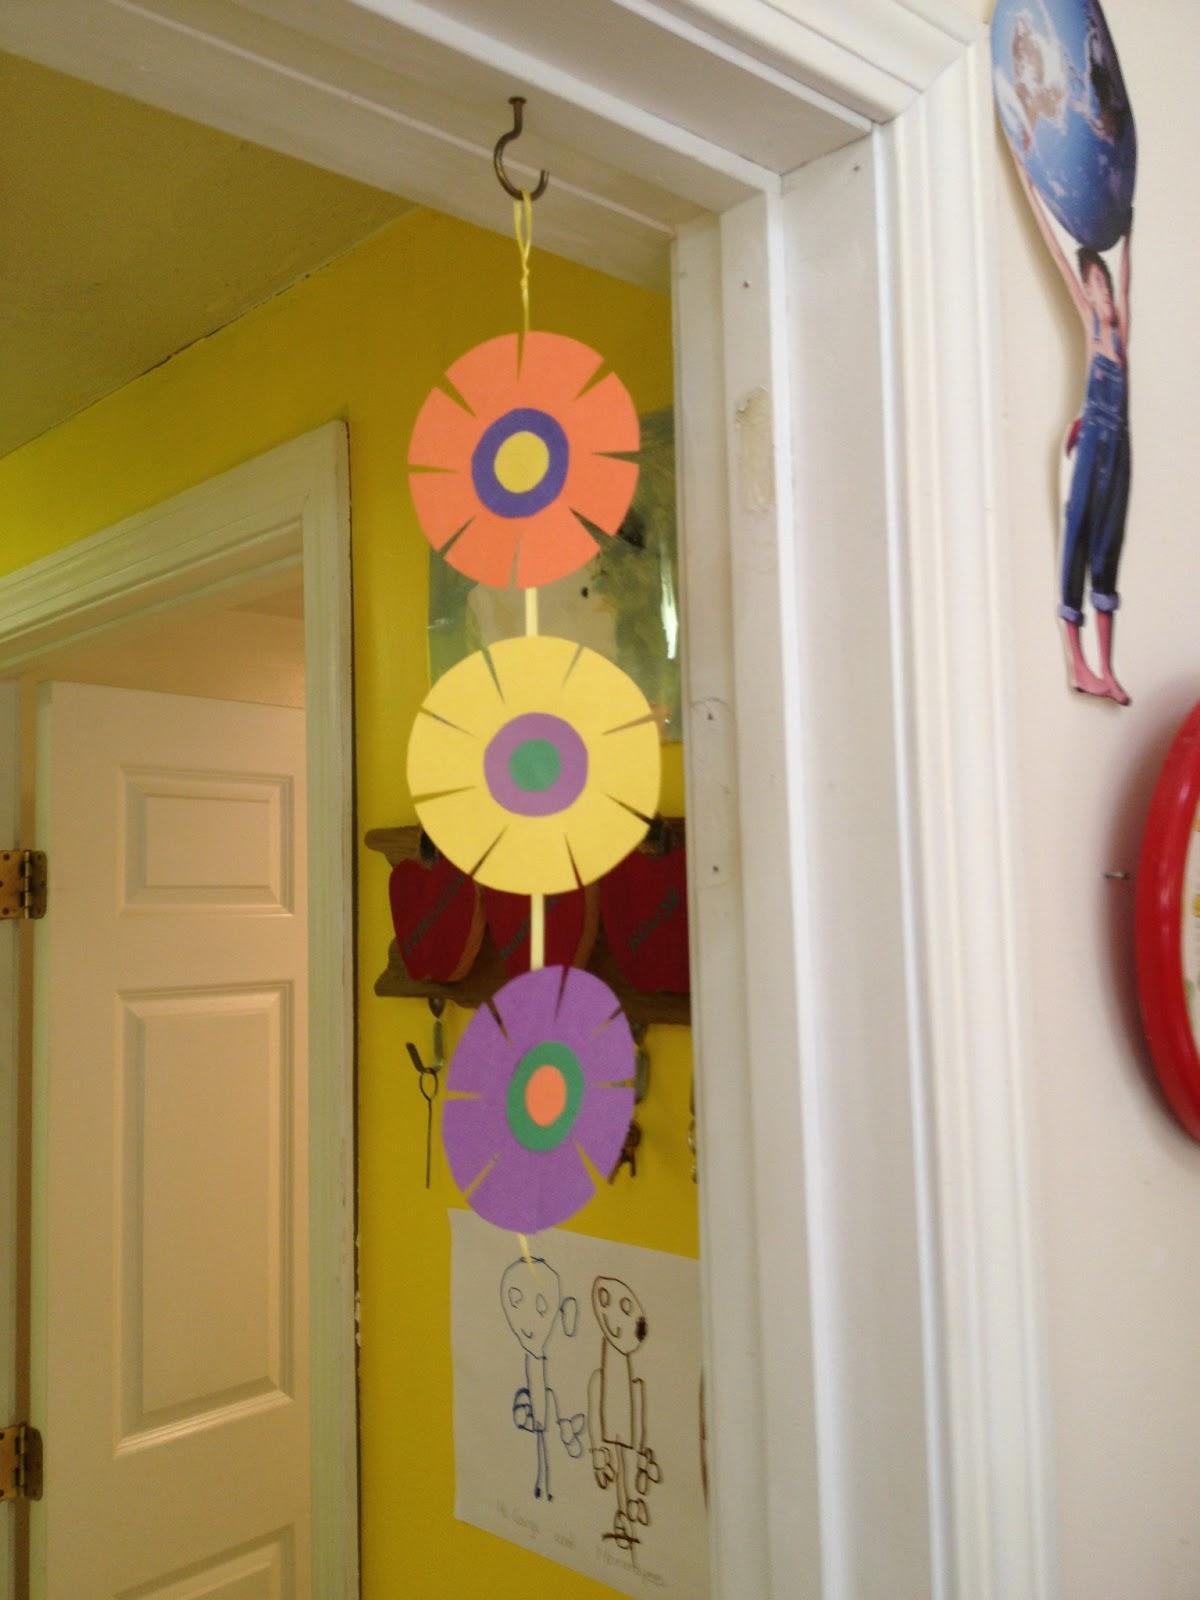 Evergreen Montessori House Hanging Flower Decoration